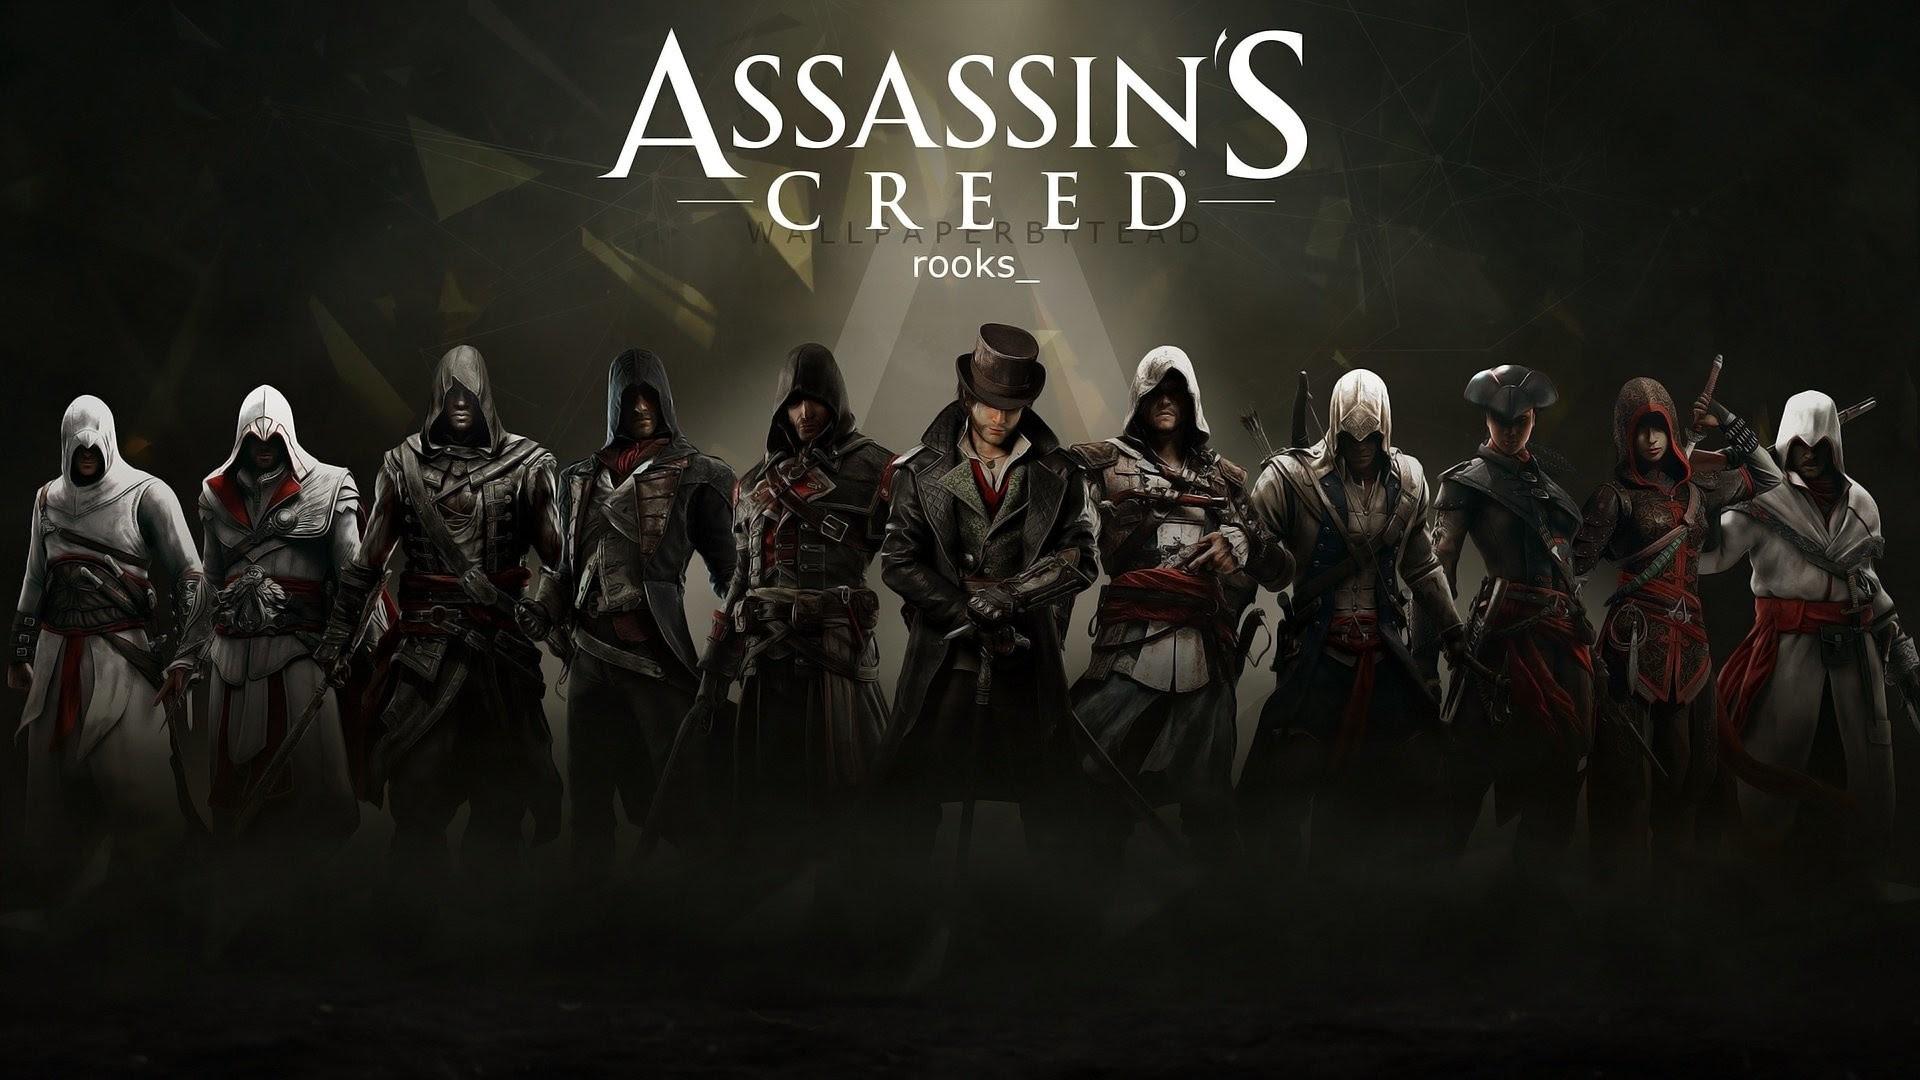 Assassins Creed All Assassins Wallpaper 88 Images